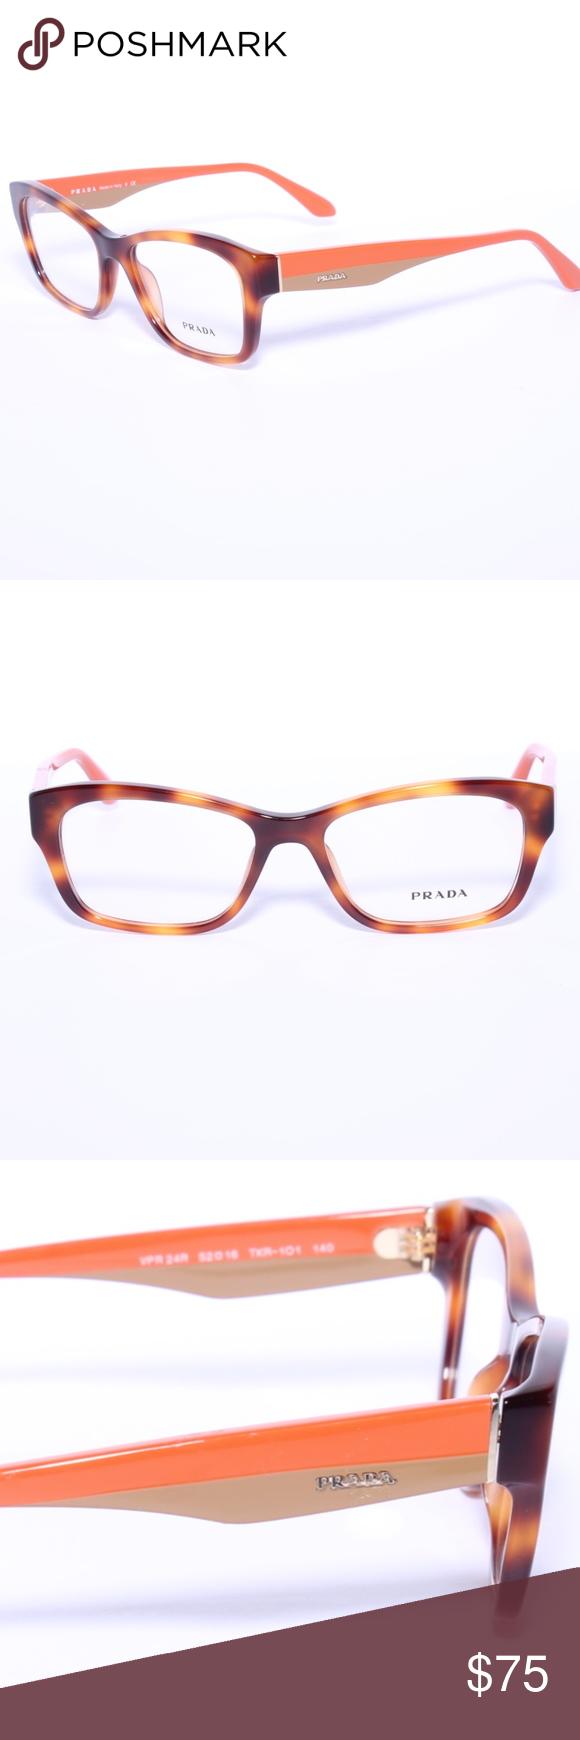 dc4d1f2356f Prada VPR 24R TKR-1O1 Havana Orange Beige New Eyeg. HavanaEyeglassesPrada BeigePouchesOrangeGlassesTaupeEye Glasses